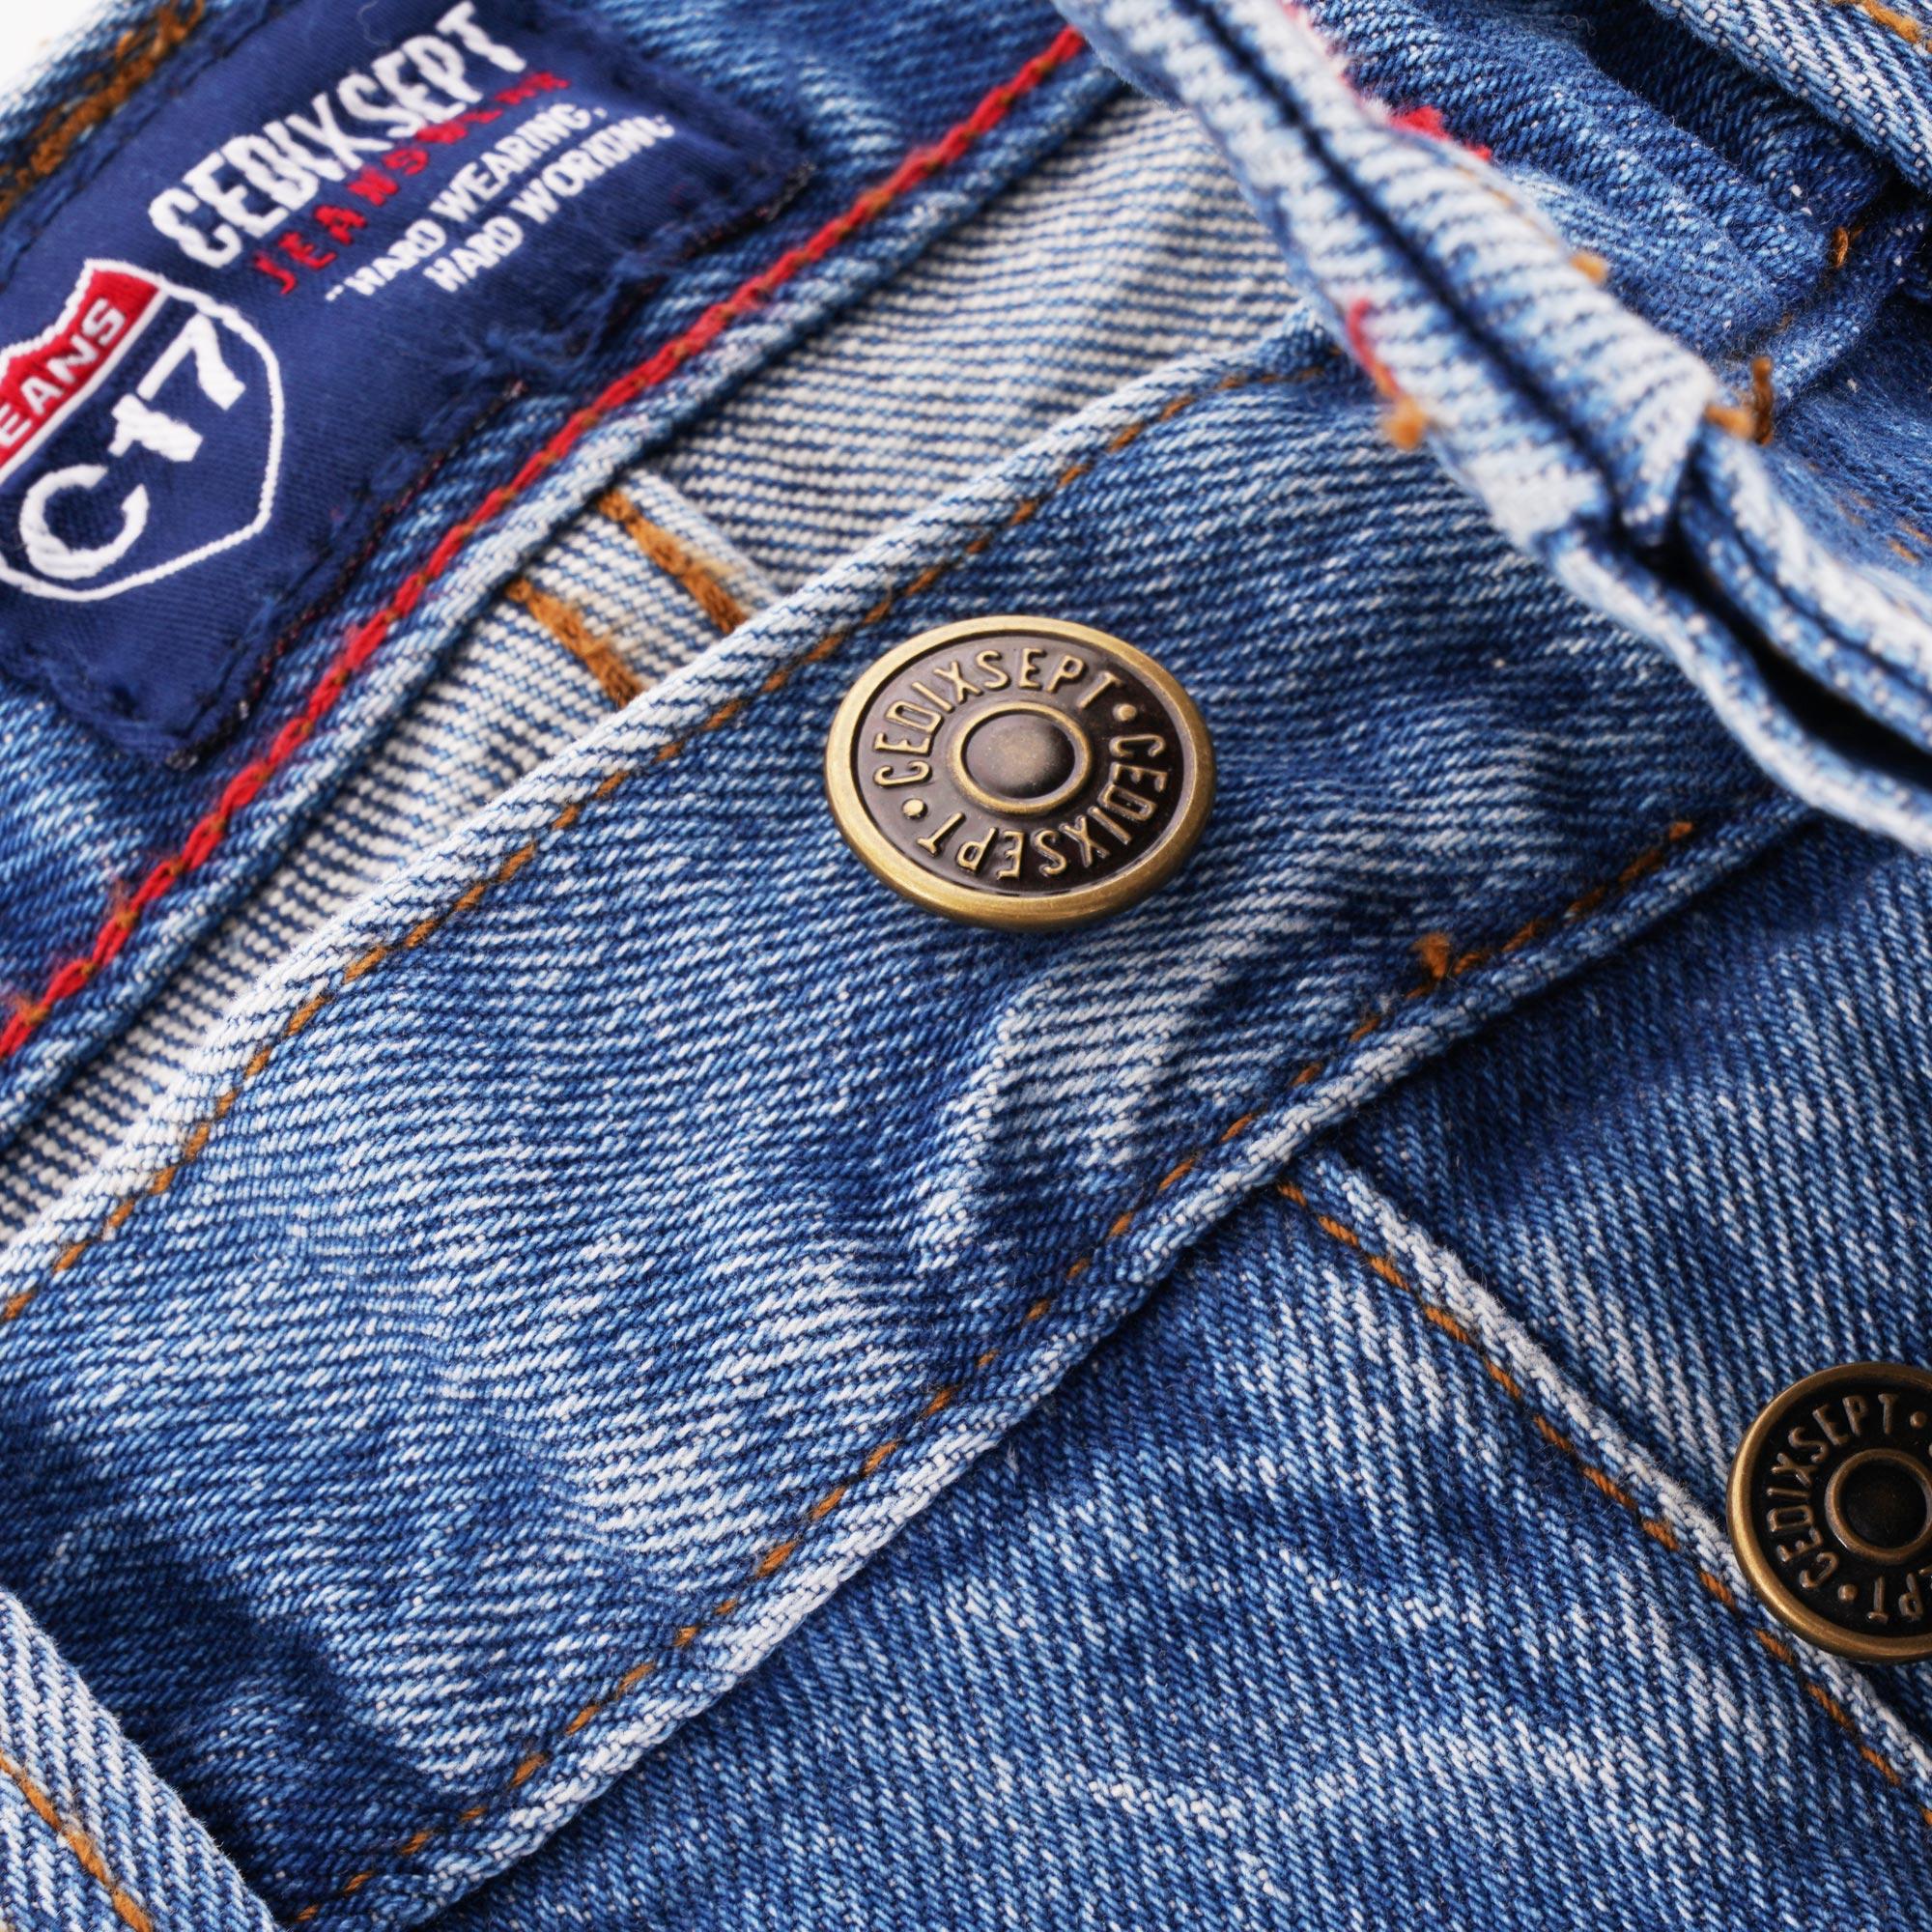 C17 Jeans Buttons